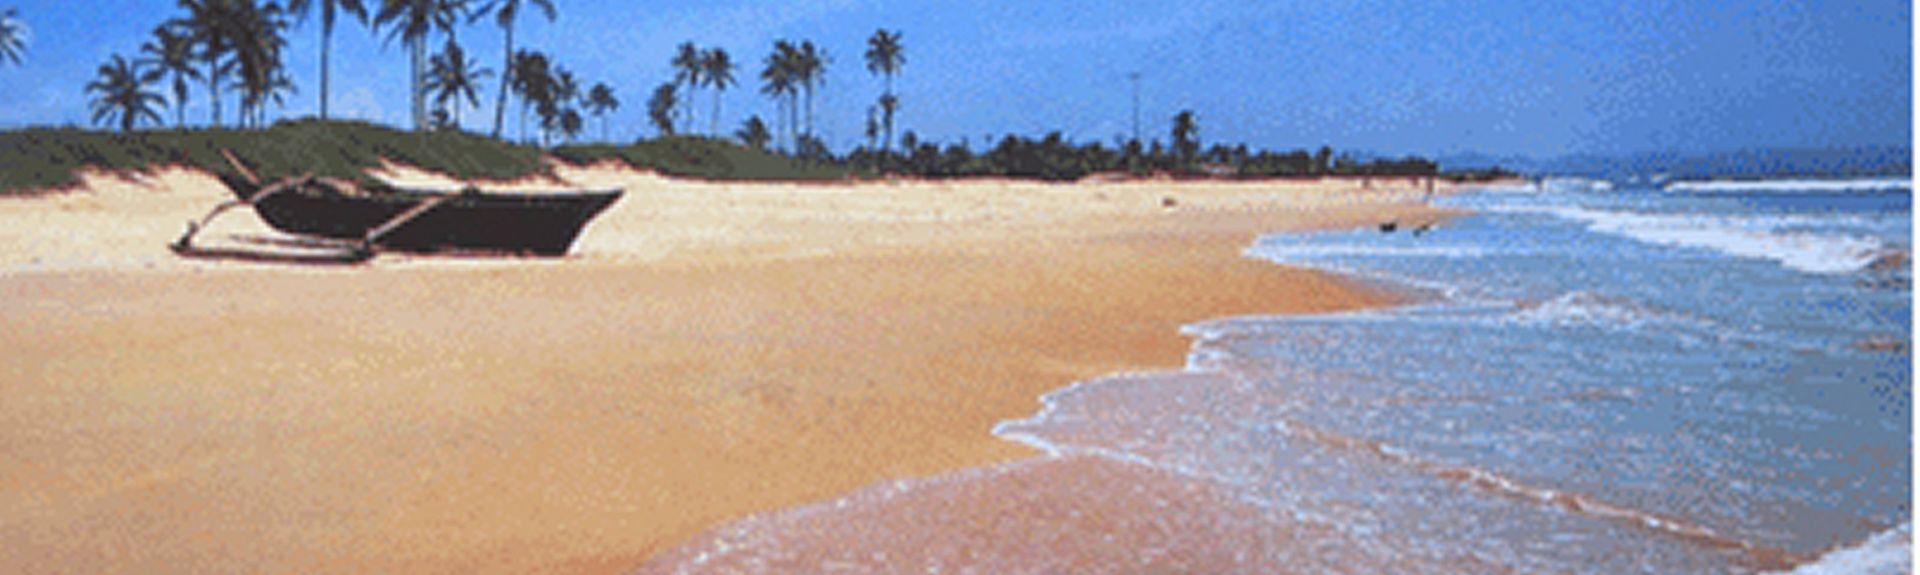 Margao, Goa, India